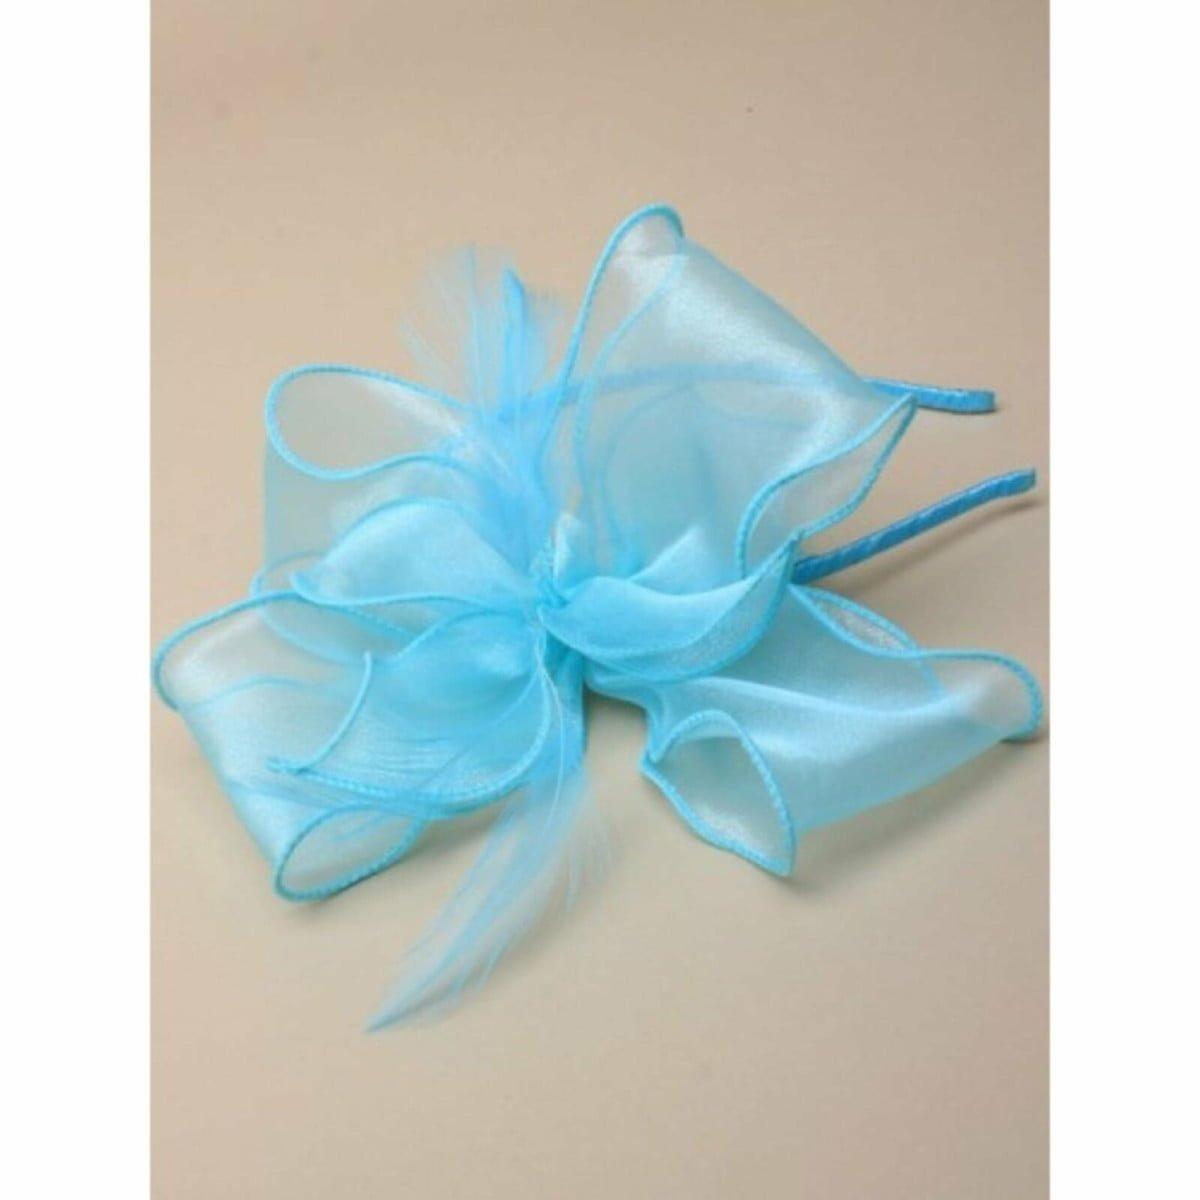 Aqua chiffon fabric fascinator on aliceband 1